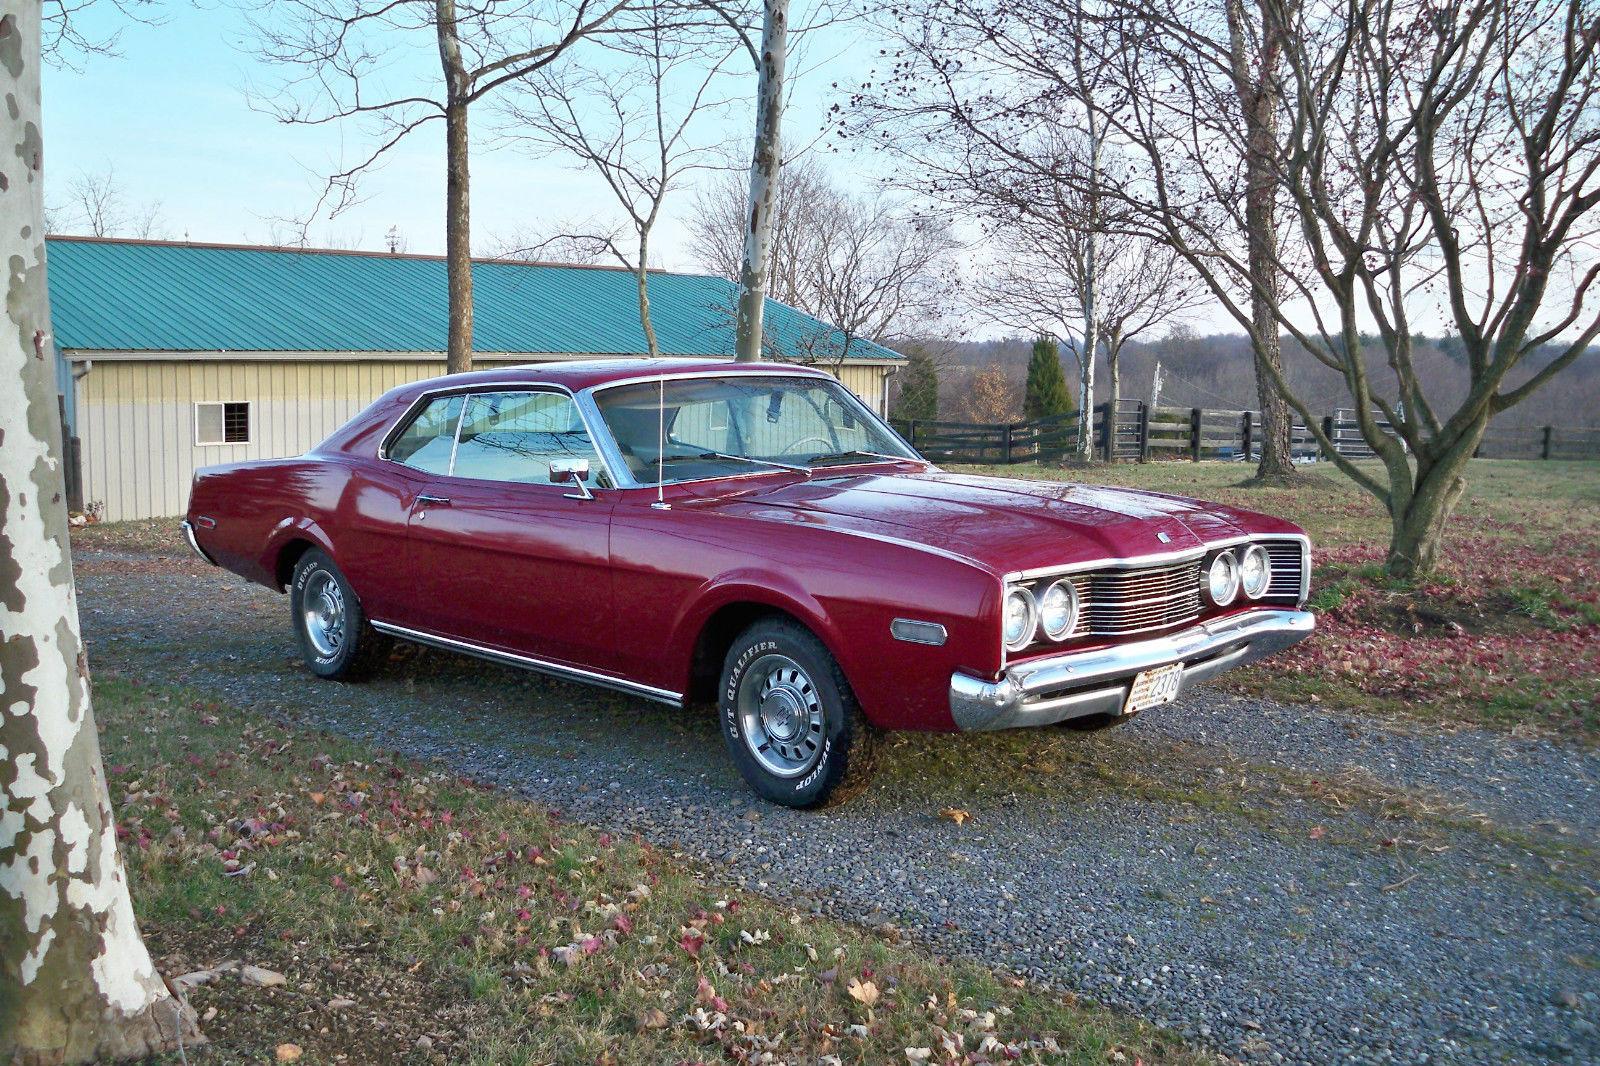 Cars For Sale In Arizona >> 1968 Mercury Montego - Classic Mercury Montego 1968 for sale